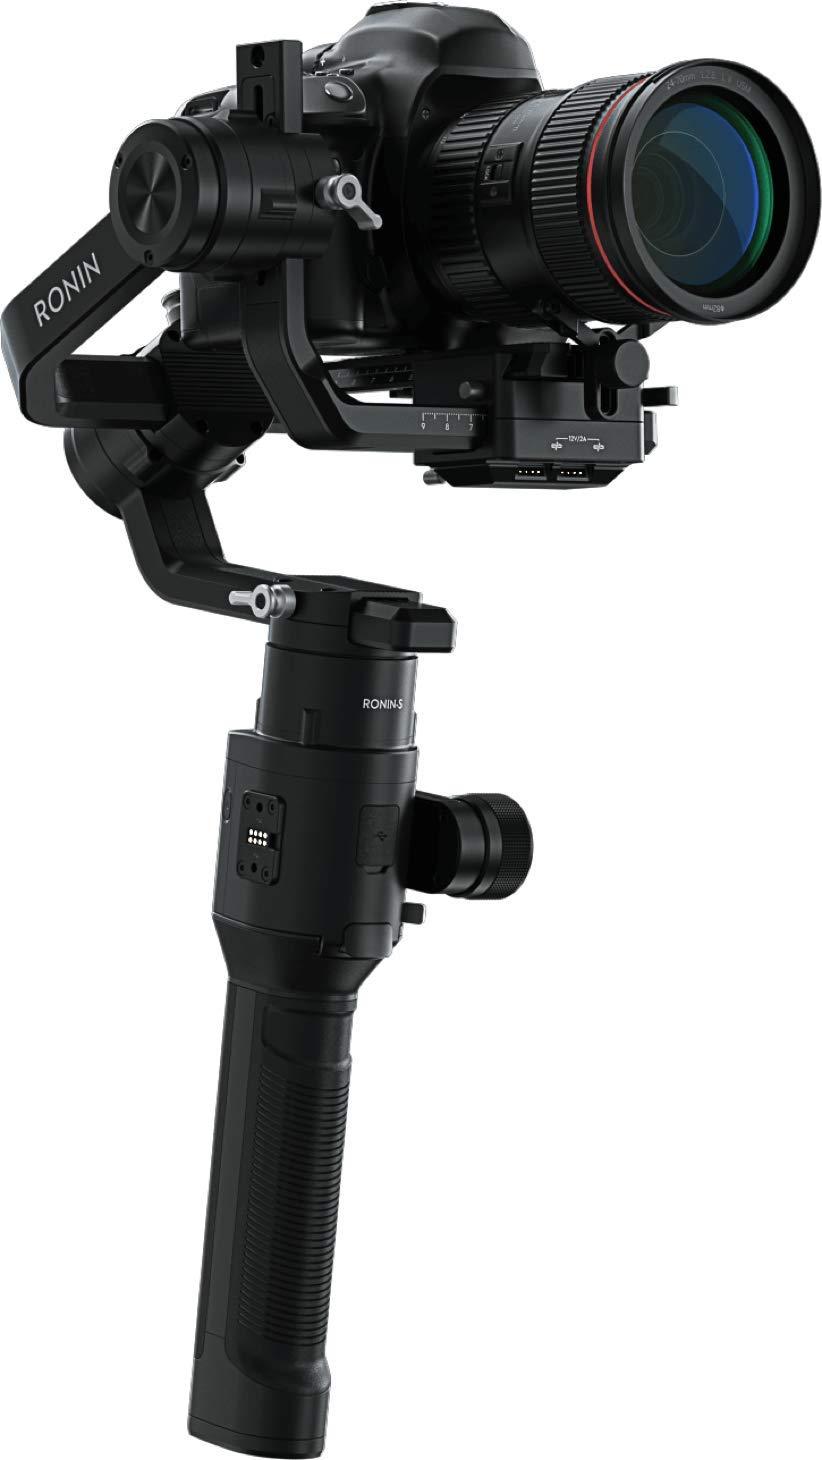 DJI Ronin-S Superior 3-axis Handheld Gimbal stabilizer: Amazon.in: Electronics